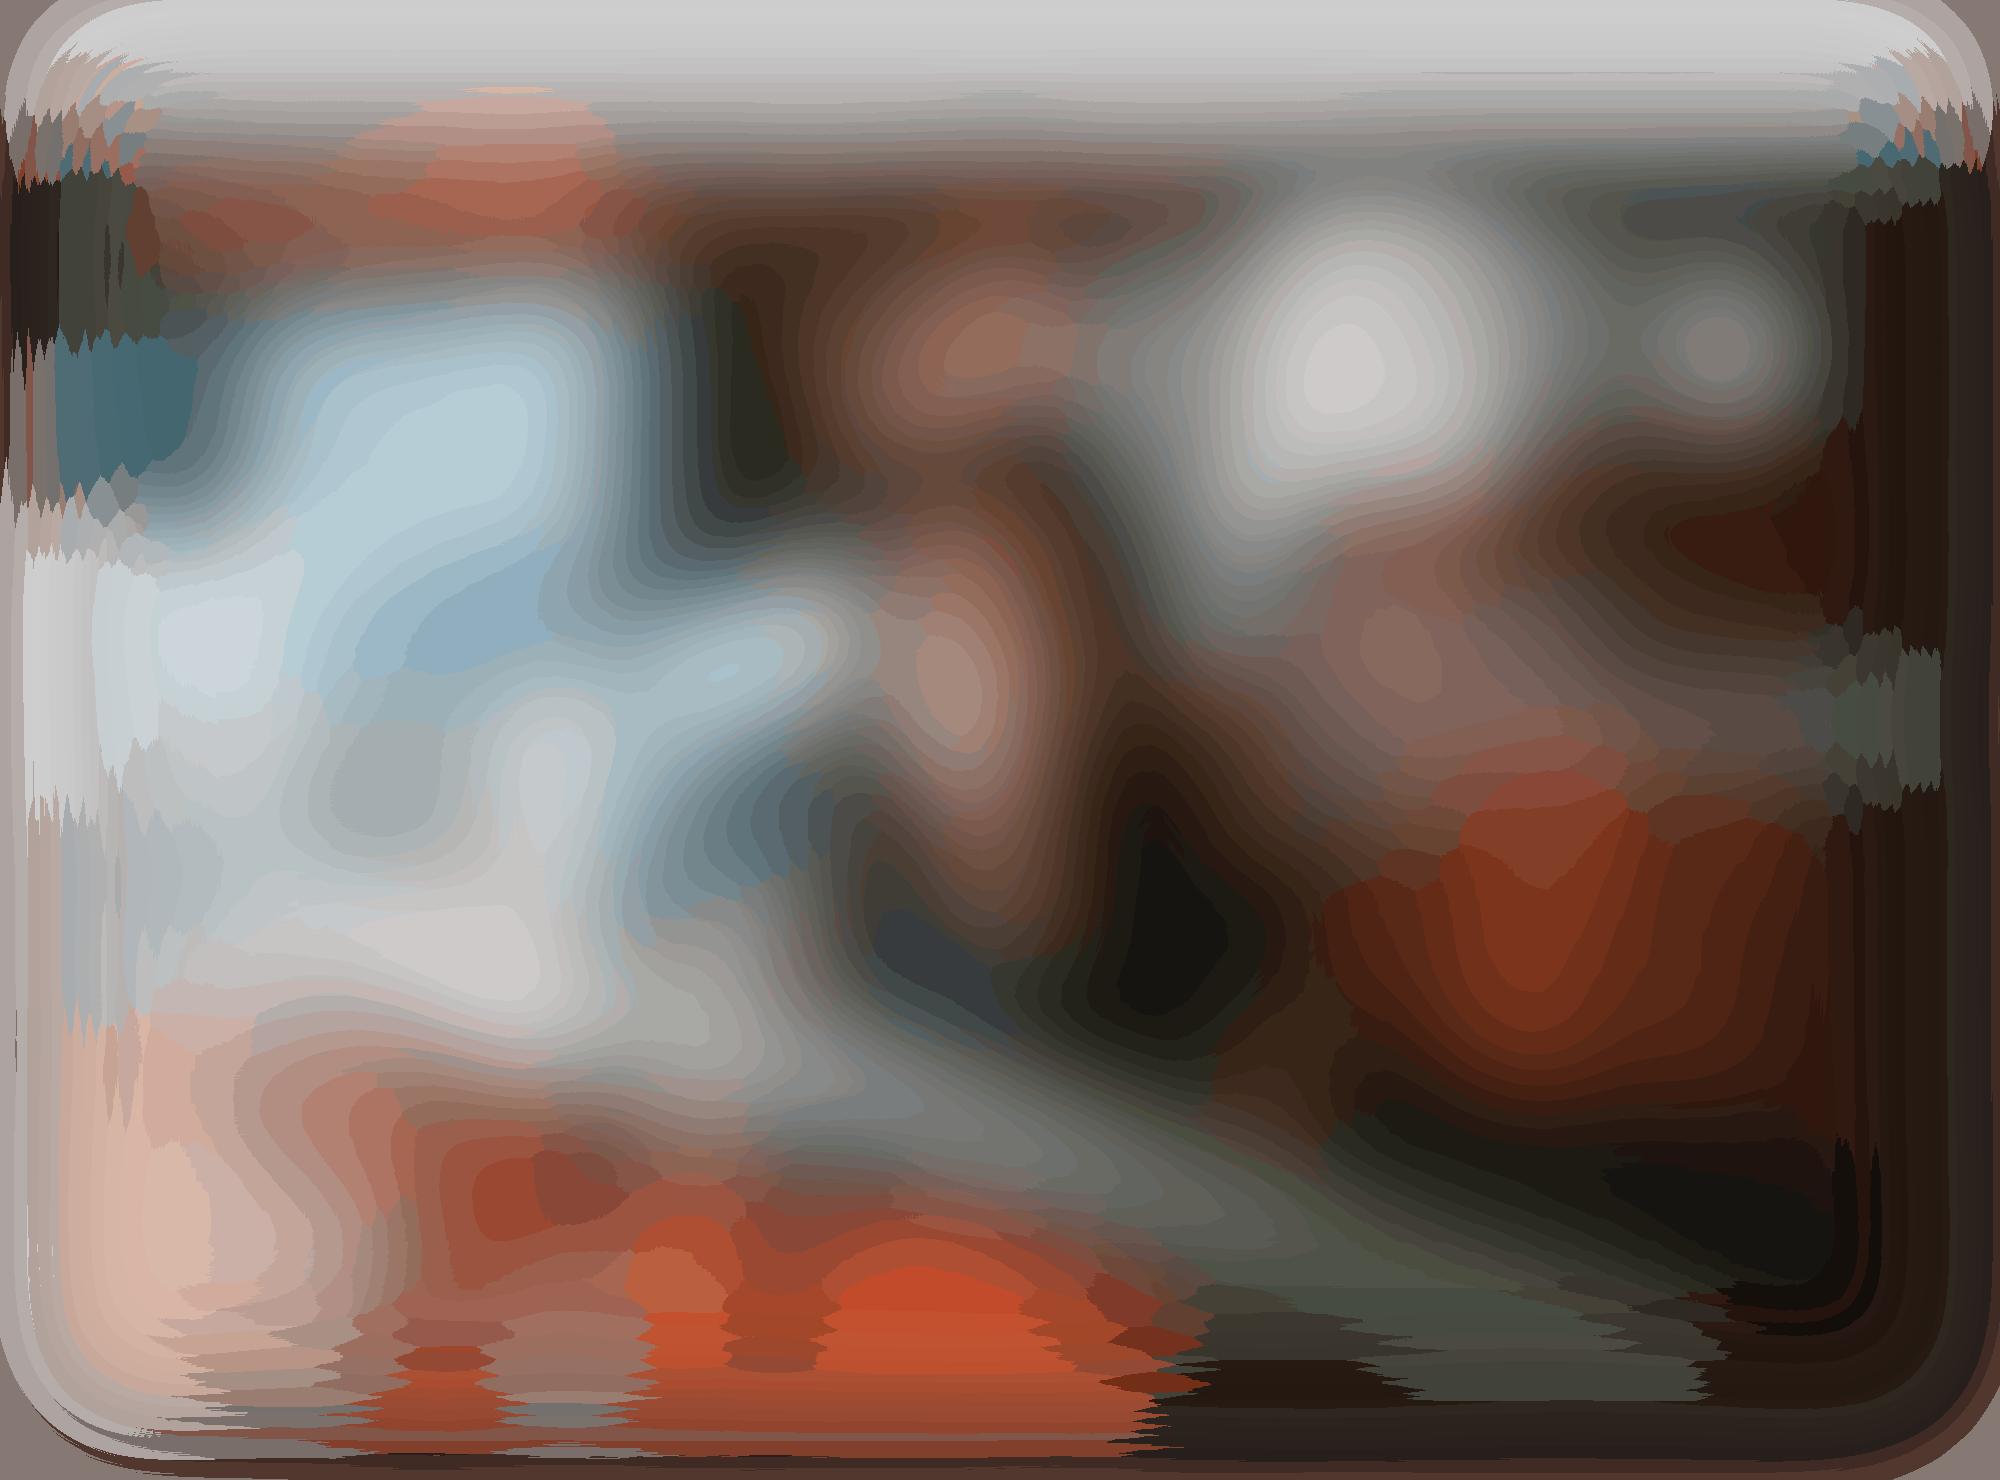 Screenshot 2019 01 16 at 10 13 40 autocompressfitresizeixlibphp 1 1 0max h2000max w3 D2000q80s8b8855deac67bfb1a4f4854c15120d8b